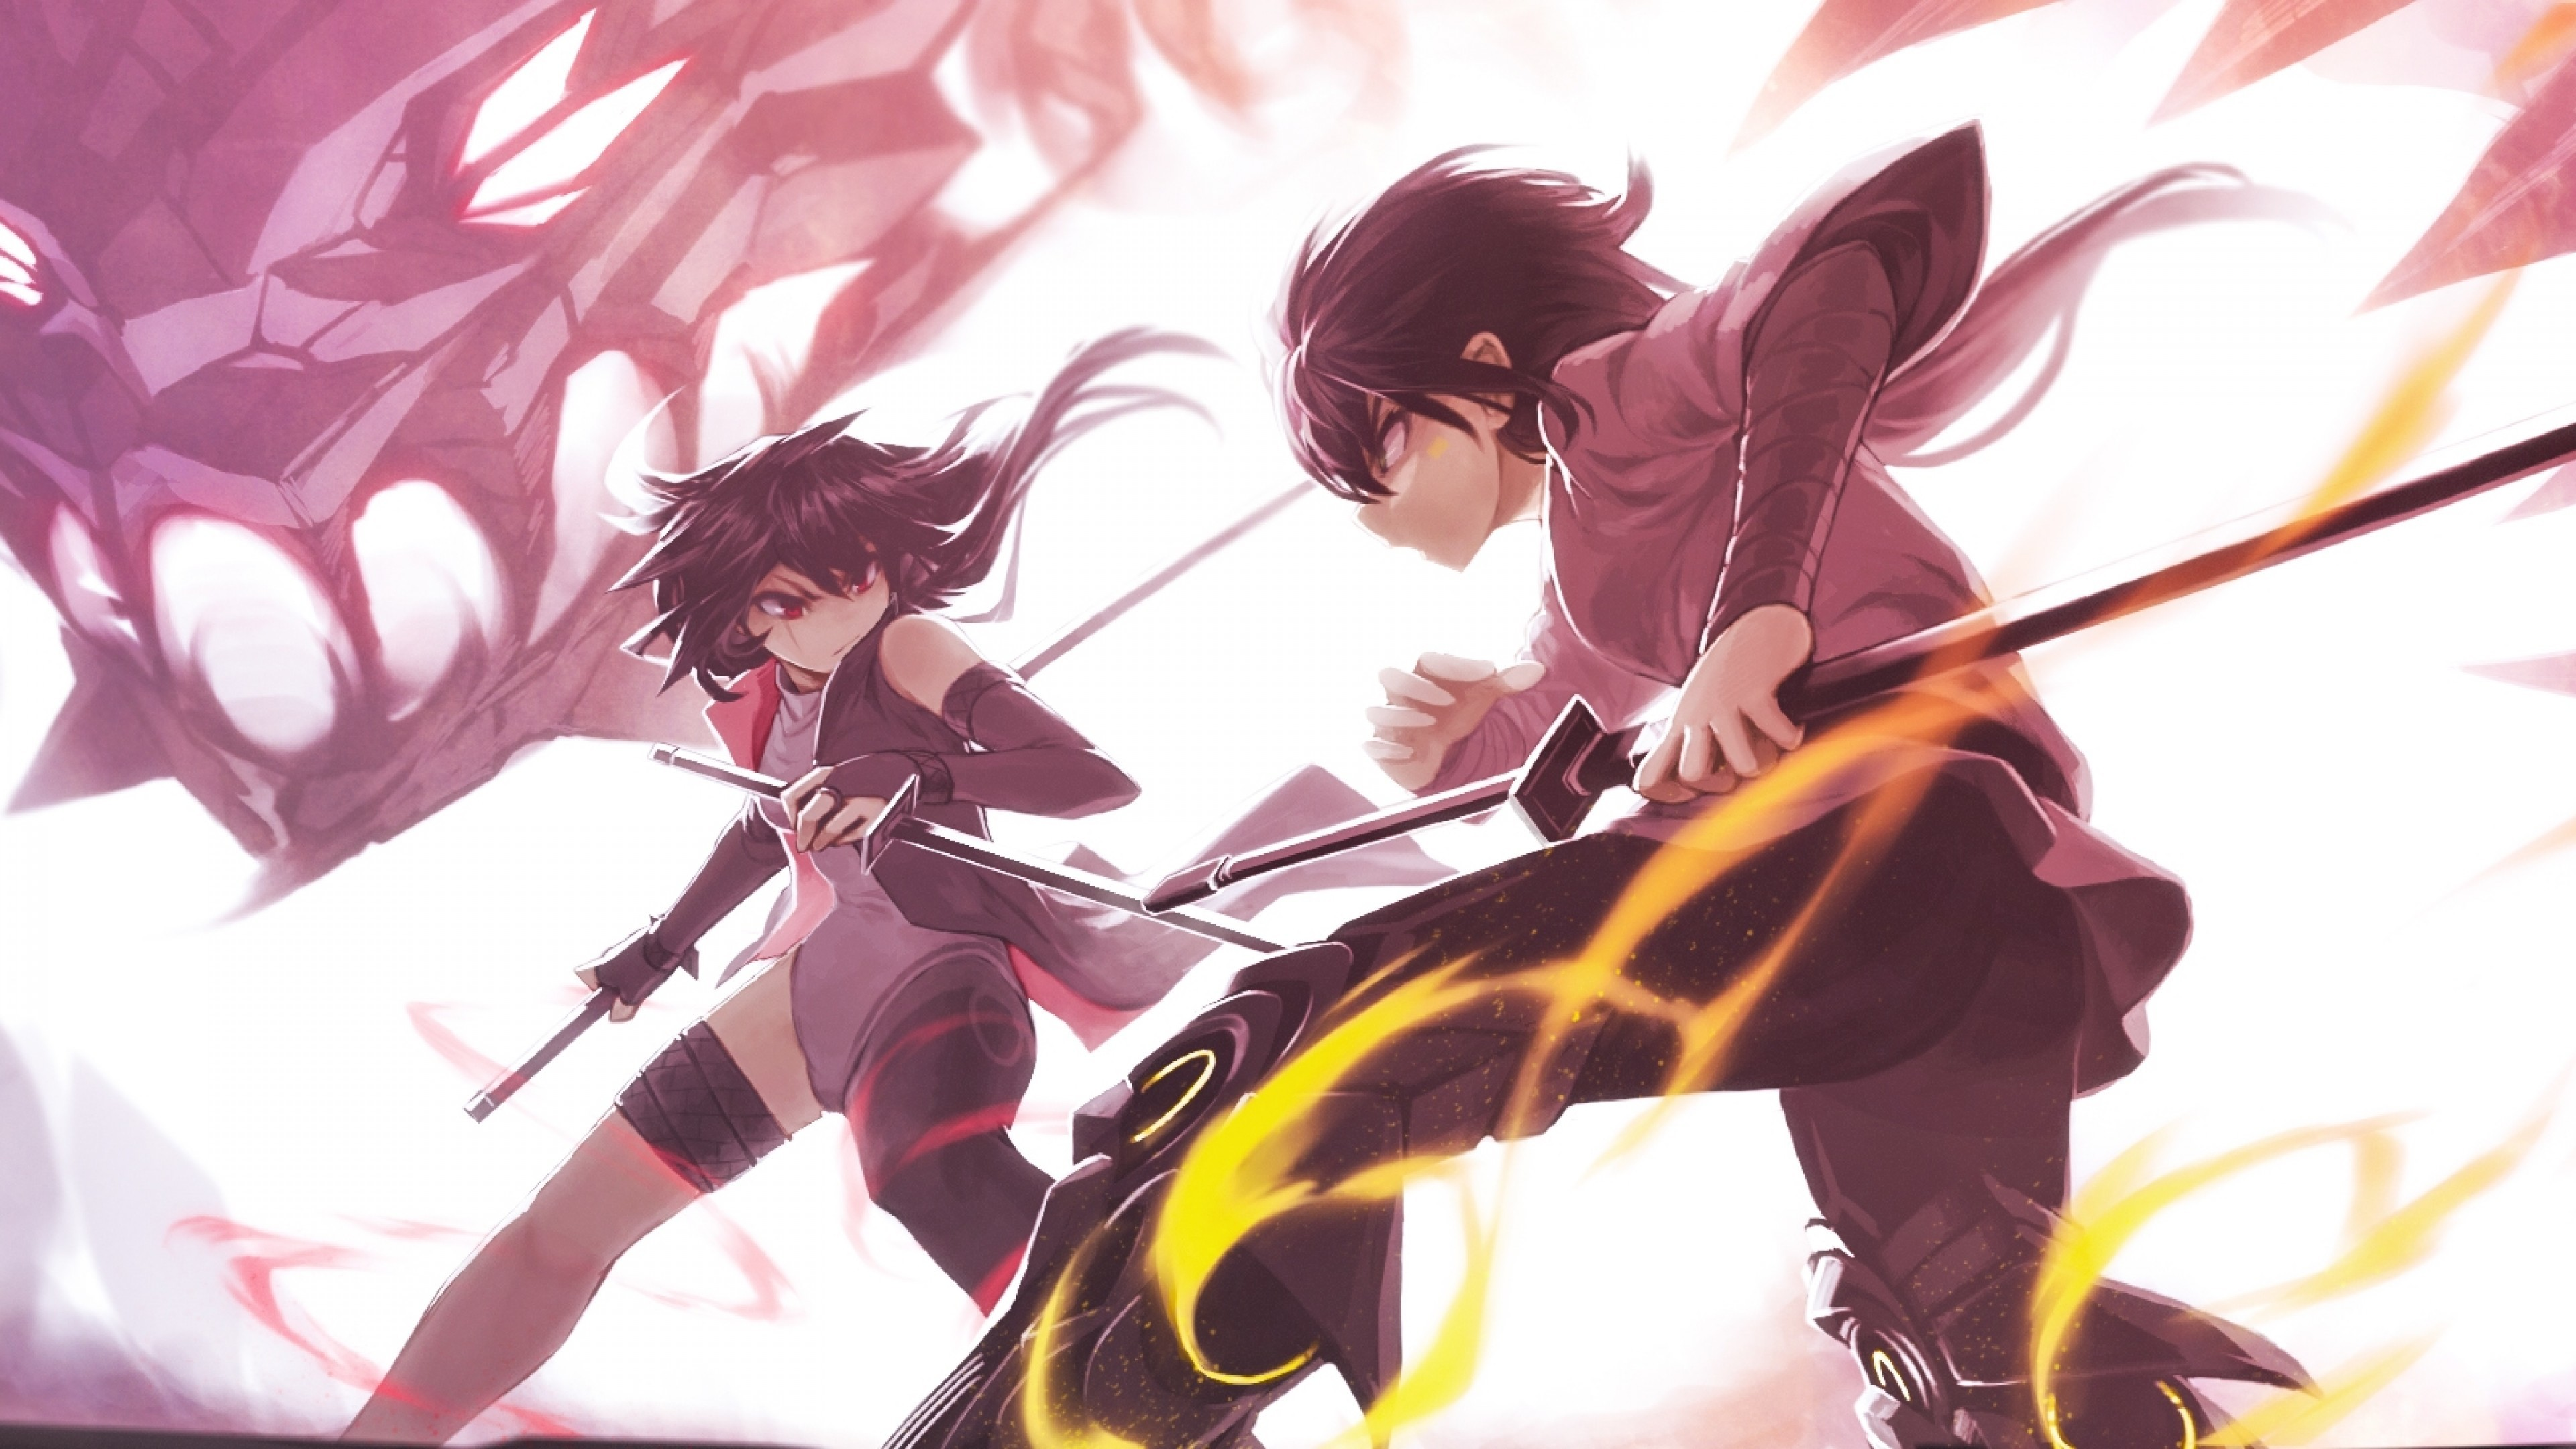 Res: 3840x2160, Anime Battle, Katana, Fighting, Dragon, Fire